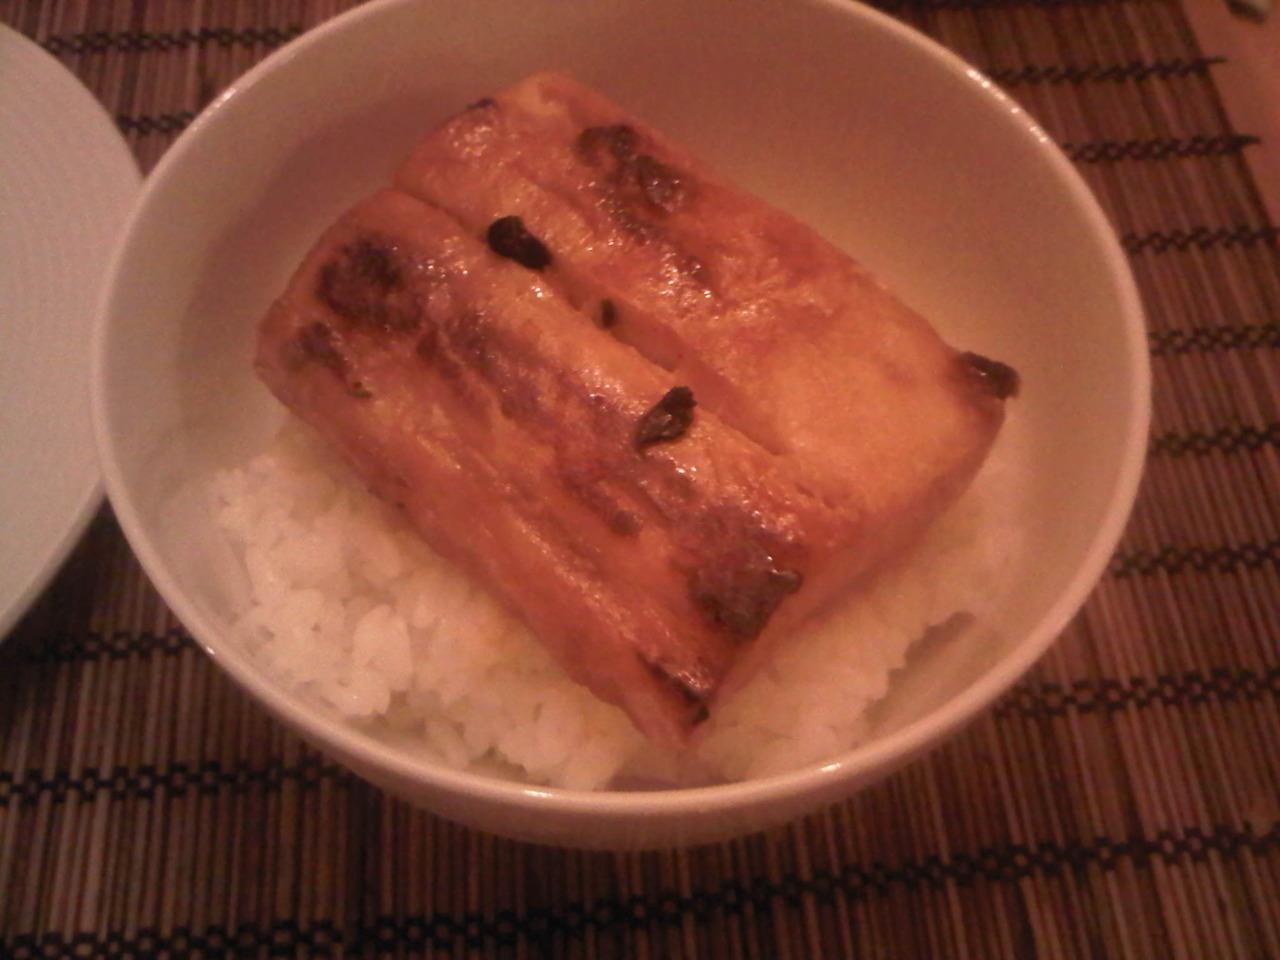 Miso Glazed Mahi Mahi: soak mahi mahi in mirin, brown sugar, and miso for 2-3 hours then sear or grill in pan.